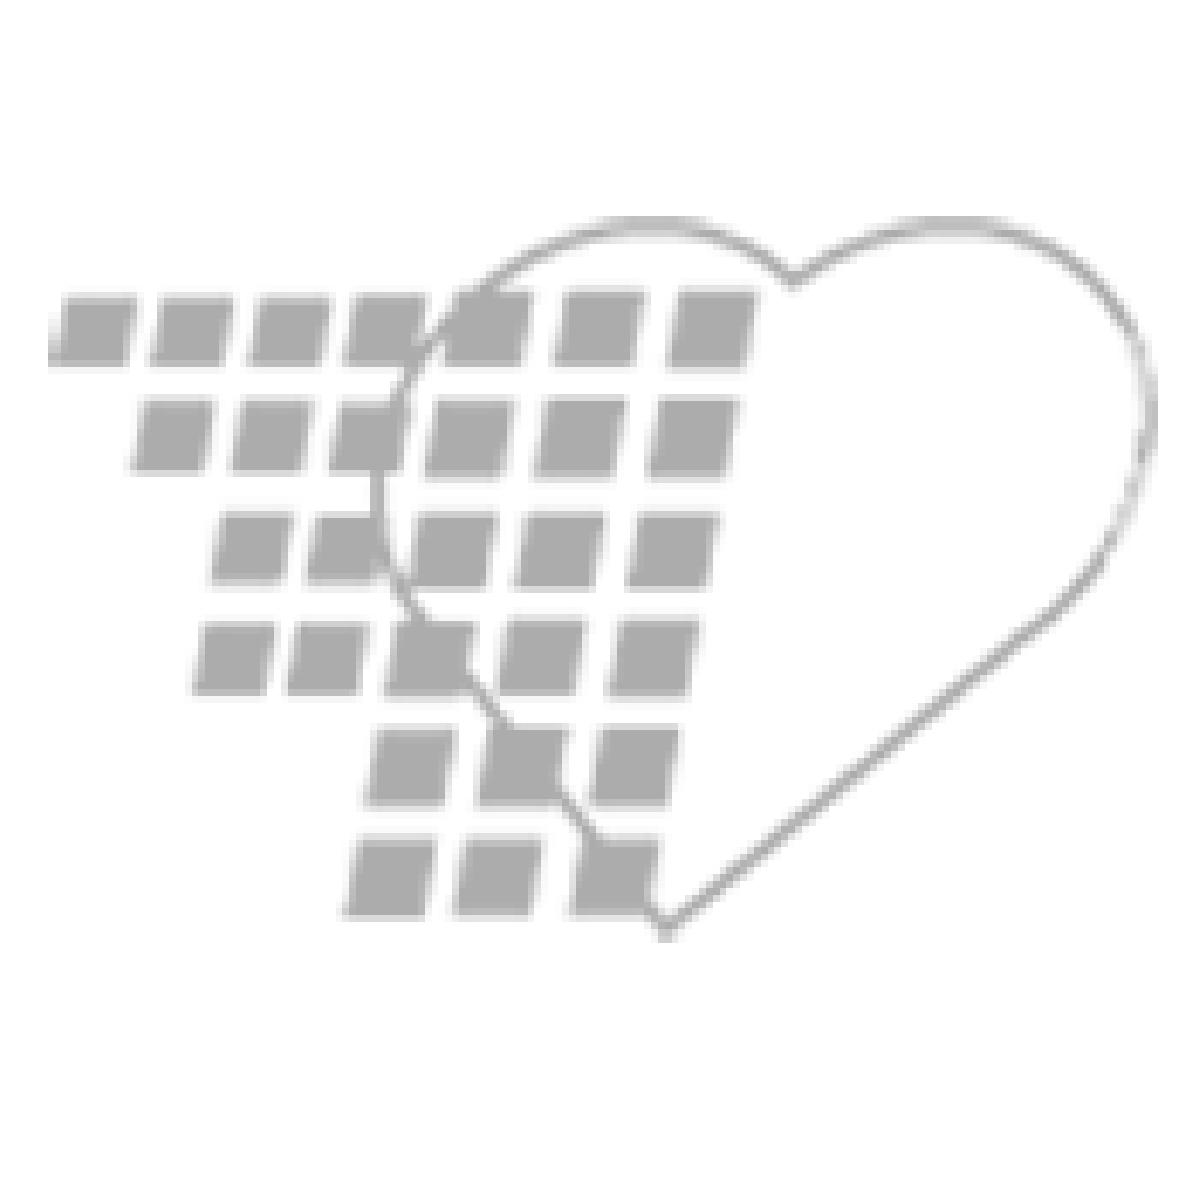 06-93-1143 - Demo Dose® Sodim Bicrb 4.2% Pediatric 10mL